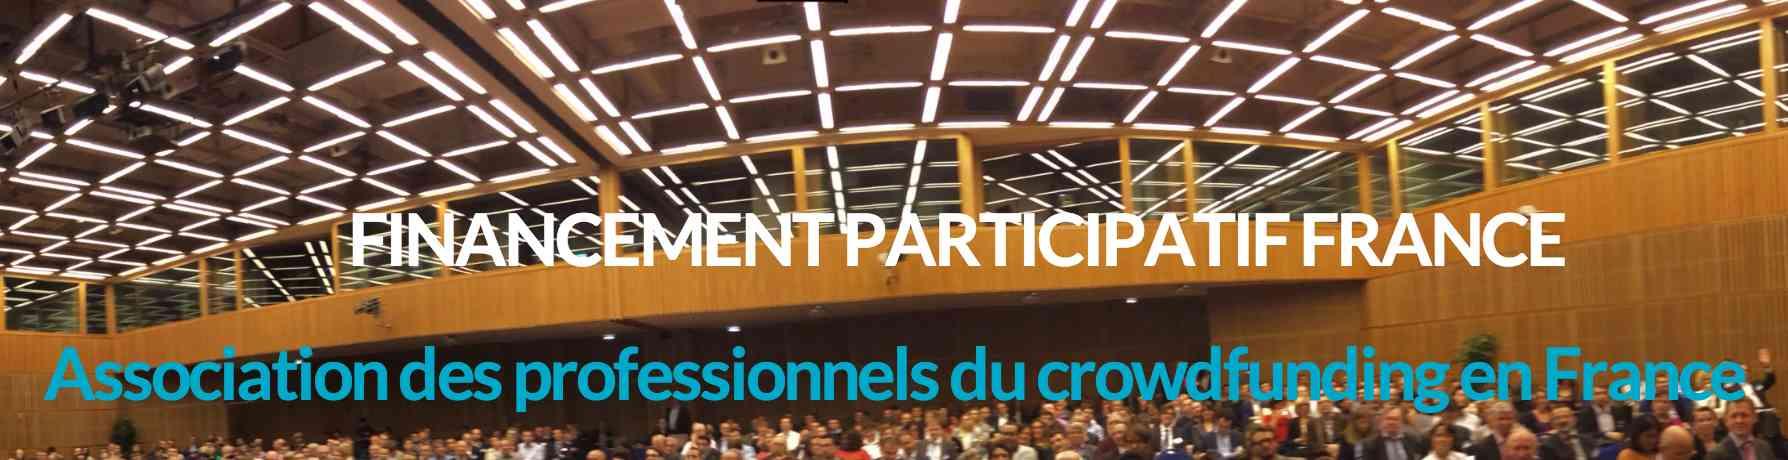 assos financement participatif